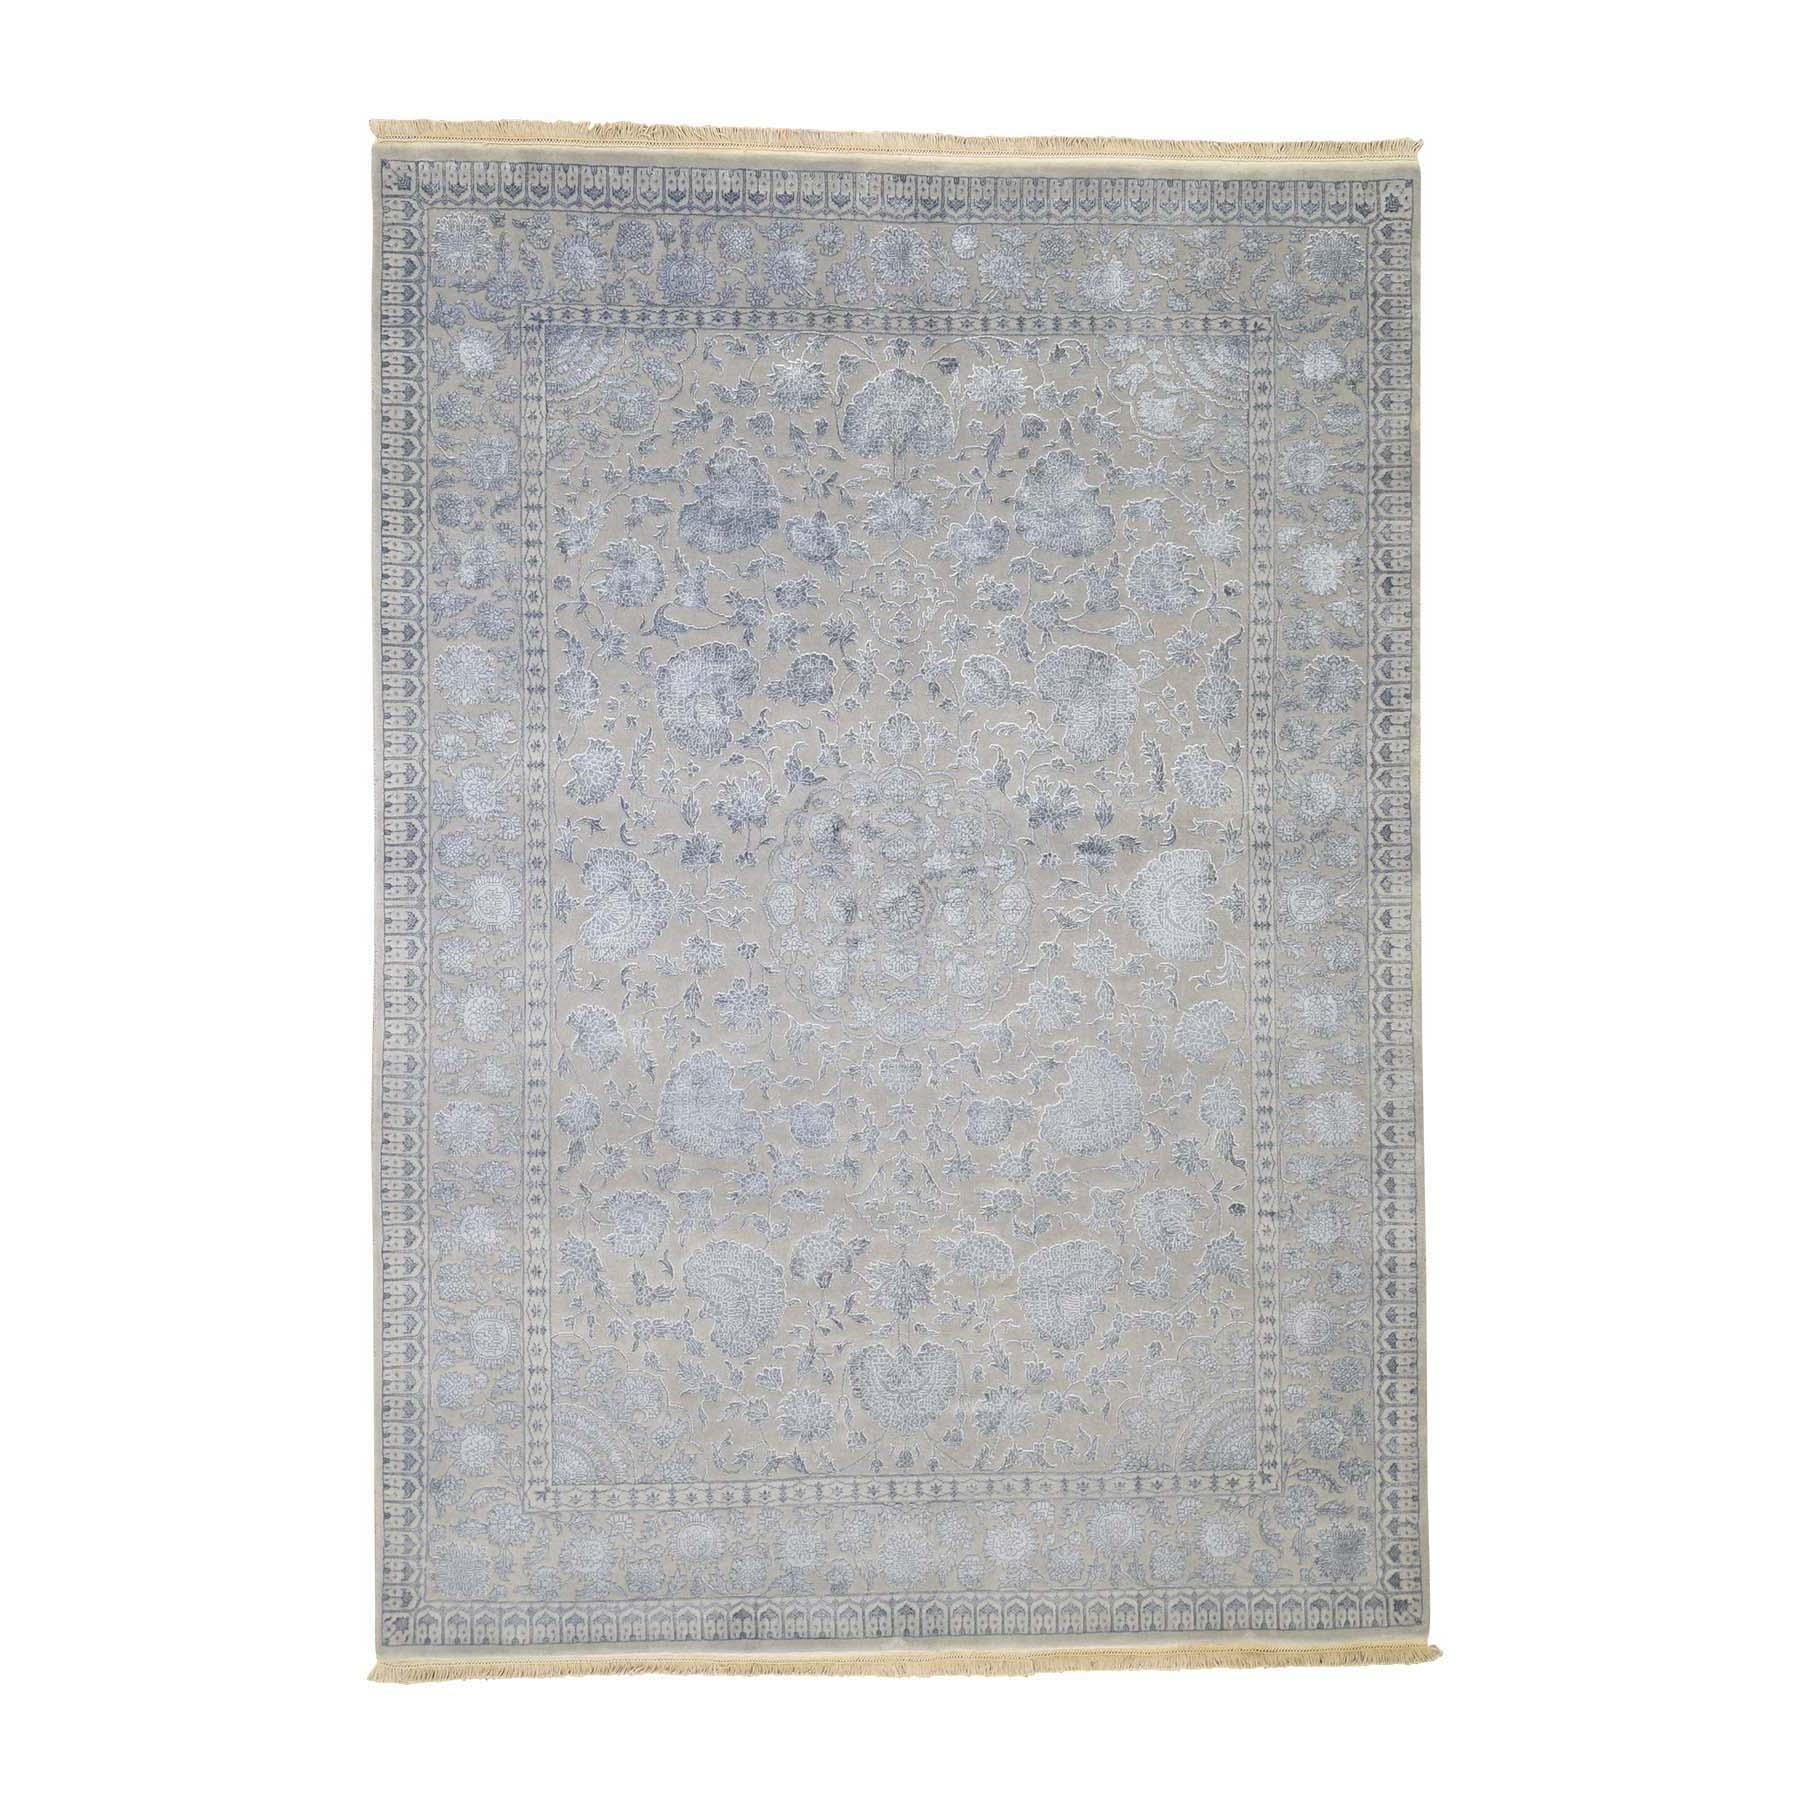 "5'7""X7'10"" Kashan 300 Kpsi Half Wool Half Silk Hand Knotted Oriental Rug moadd7ba"